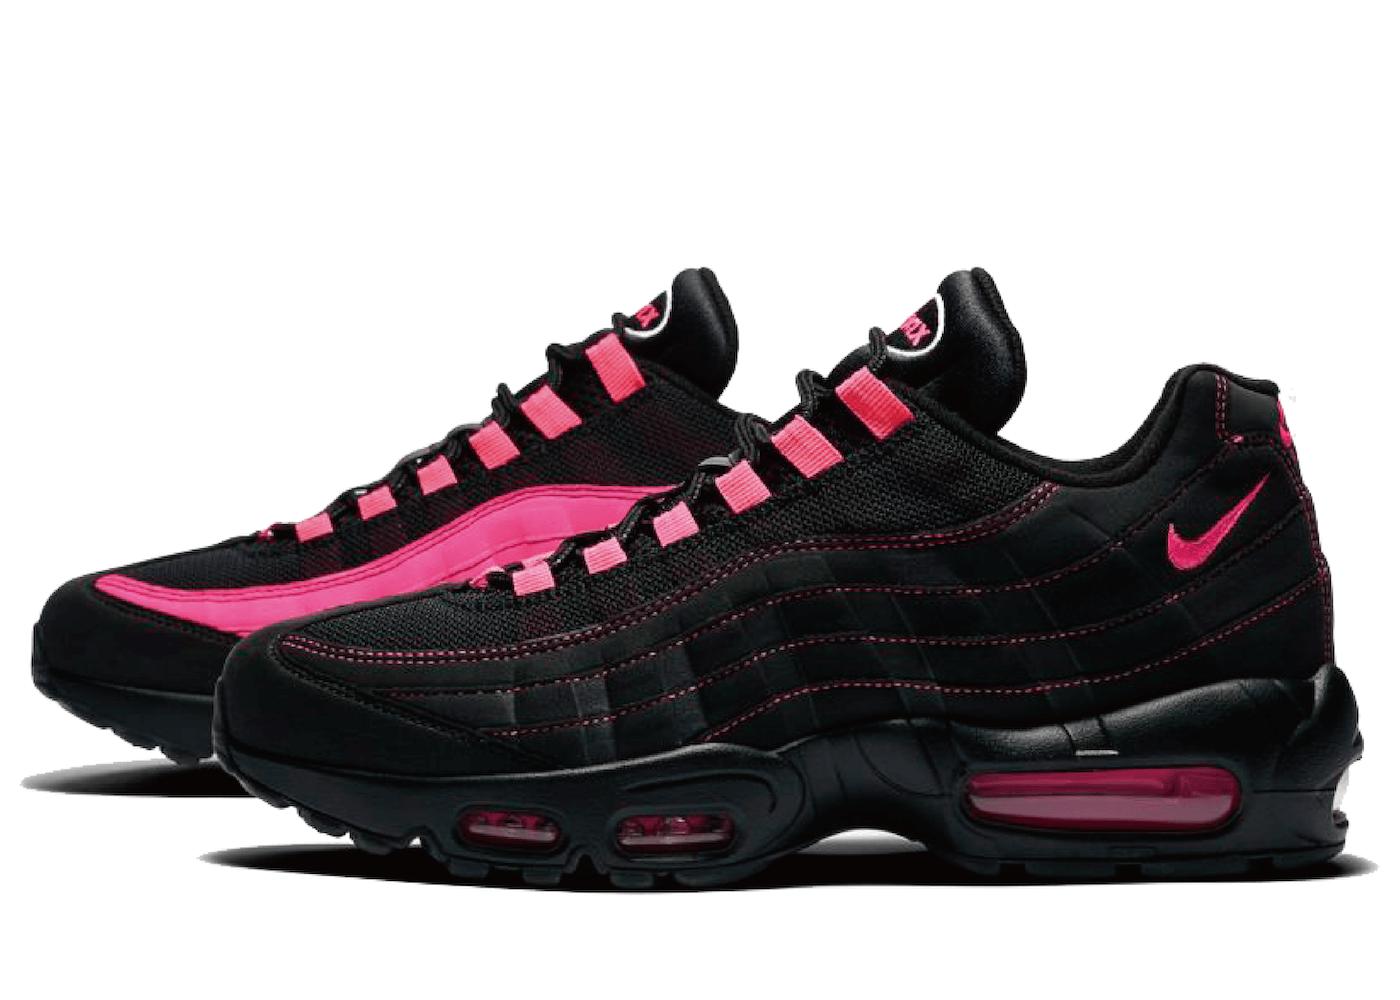 Nike Air Max 95 Black Pinkの写真